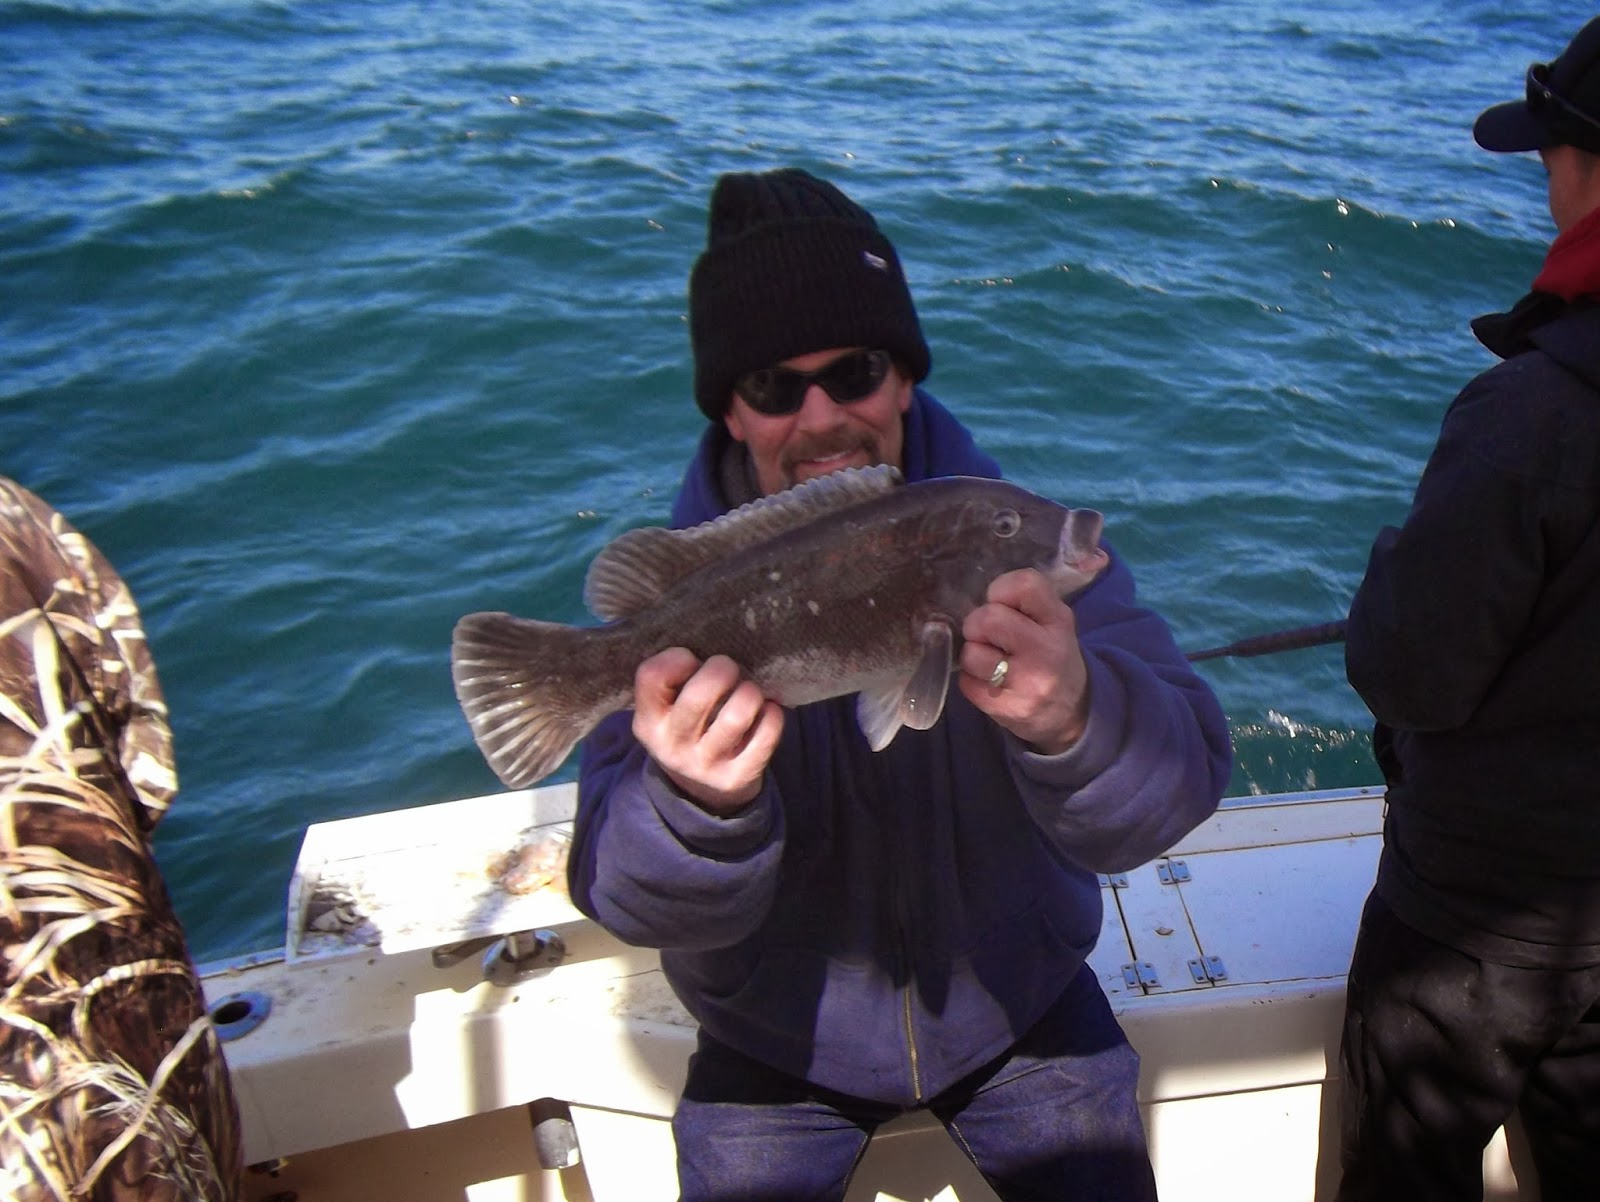 Rock hound charters january 2014 for Fishing charters near me